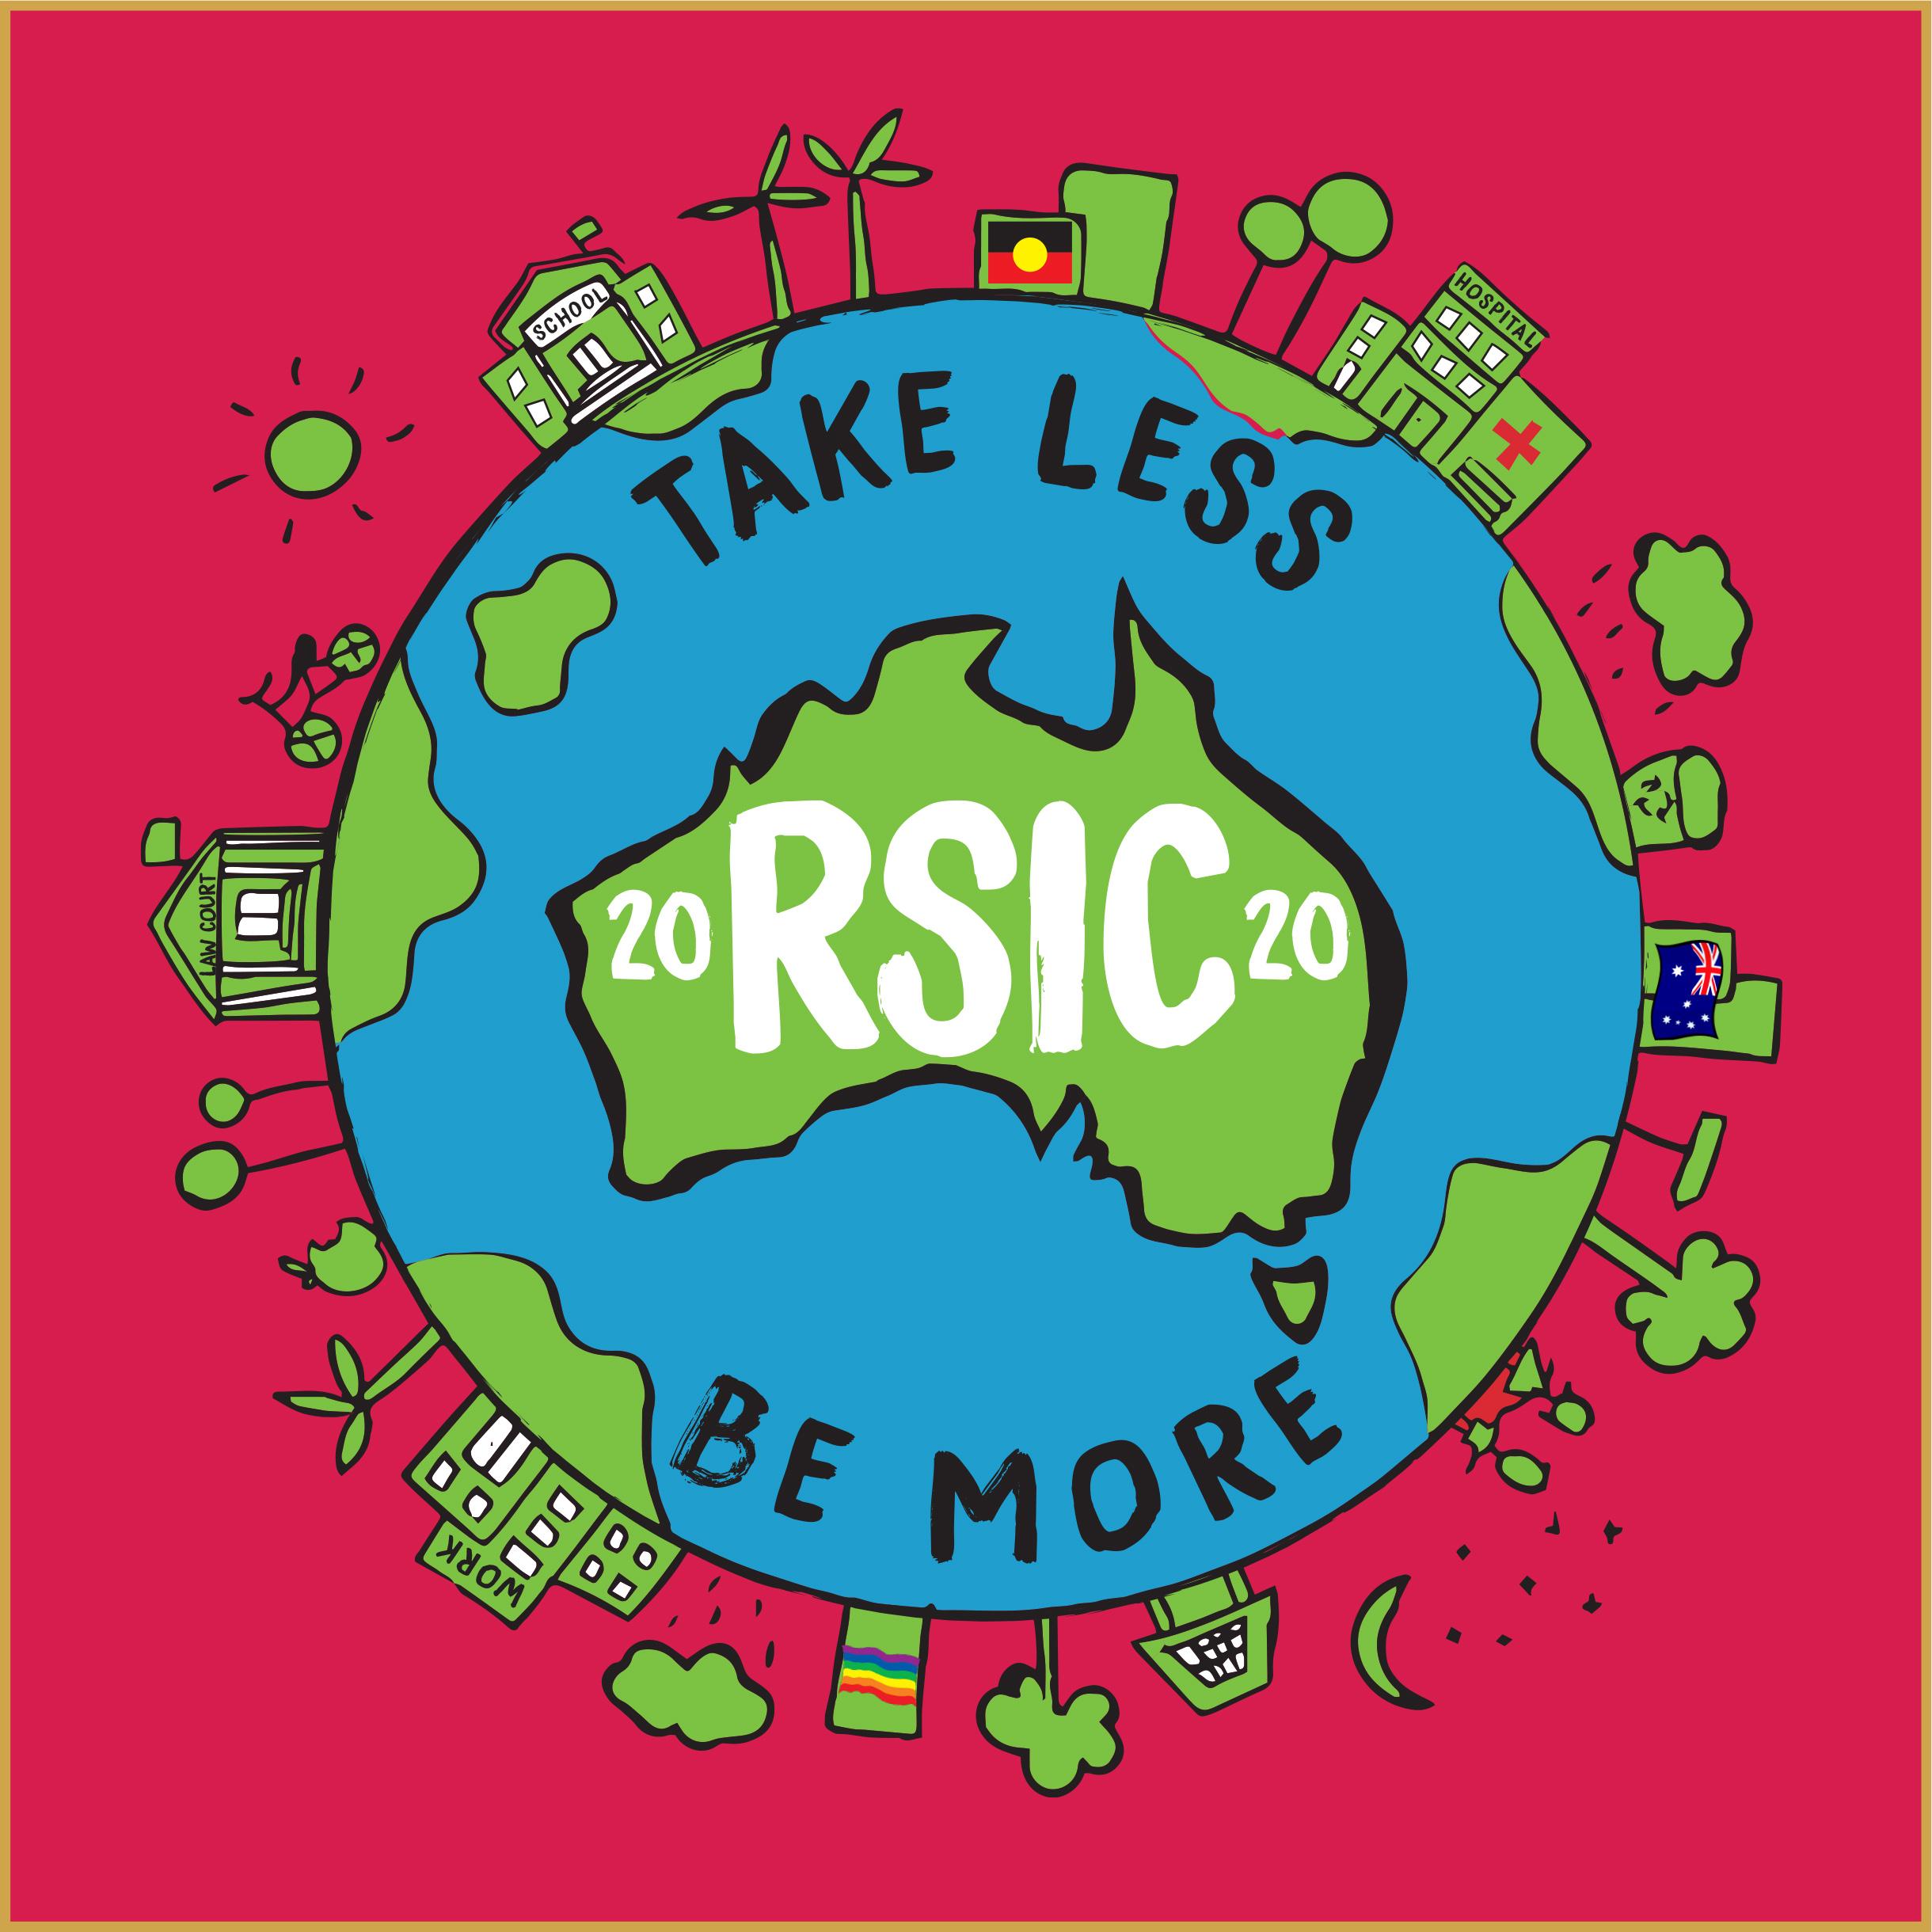 RSIC 2020 logo